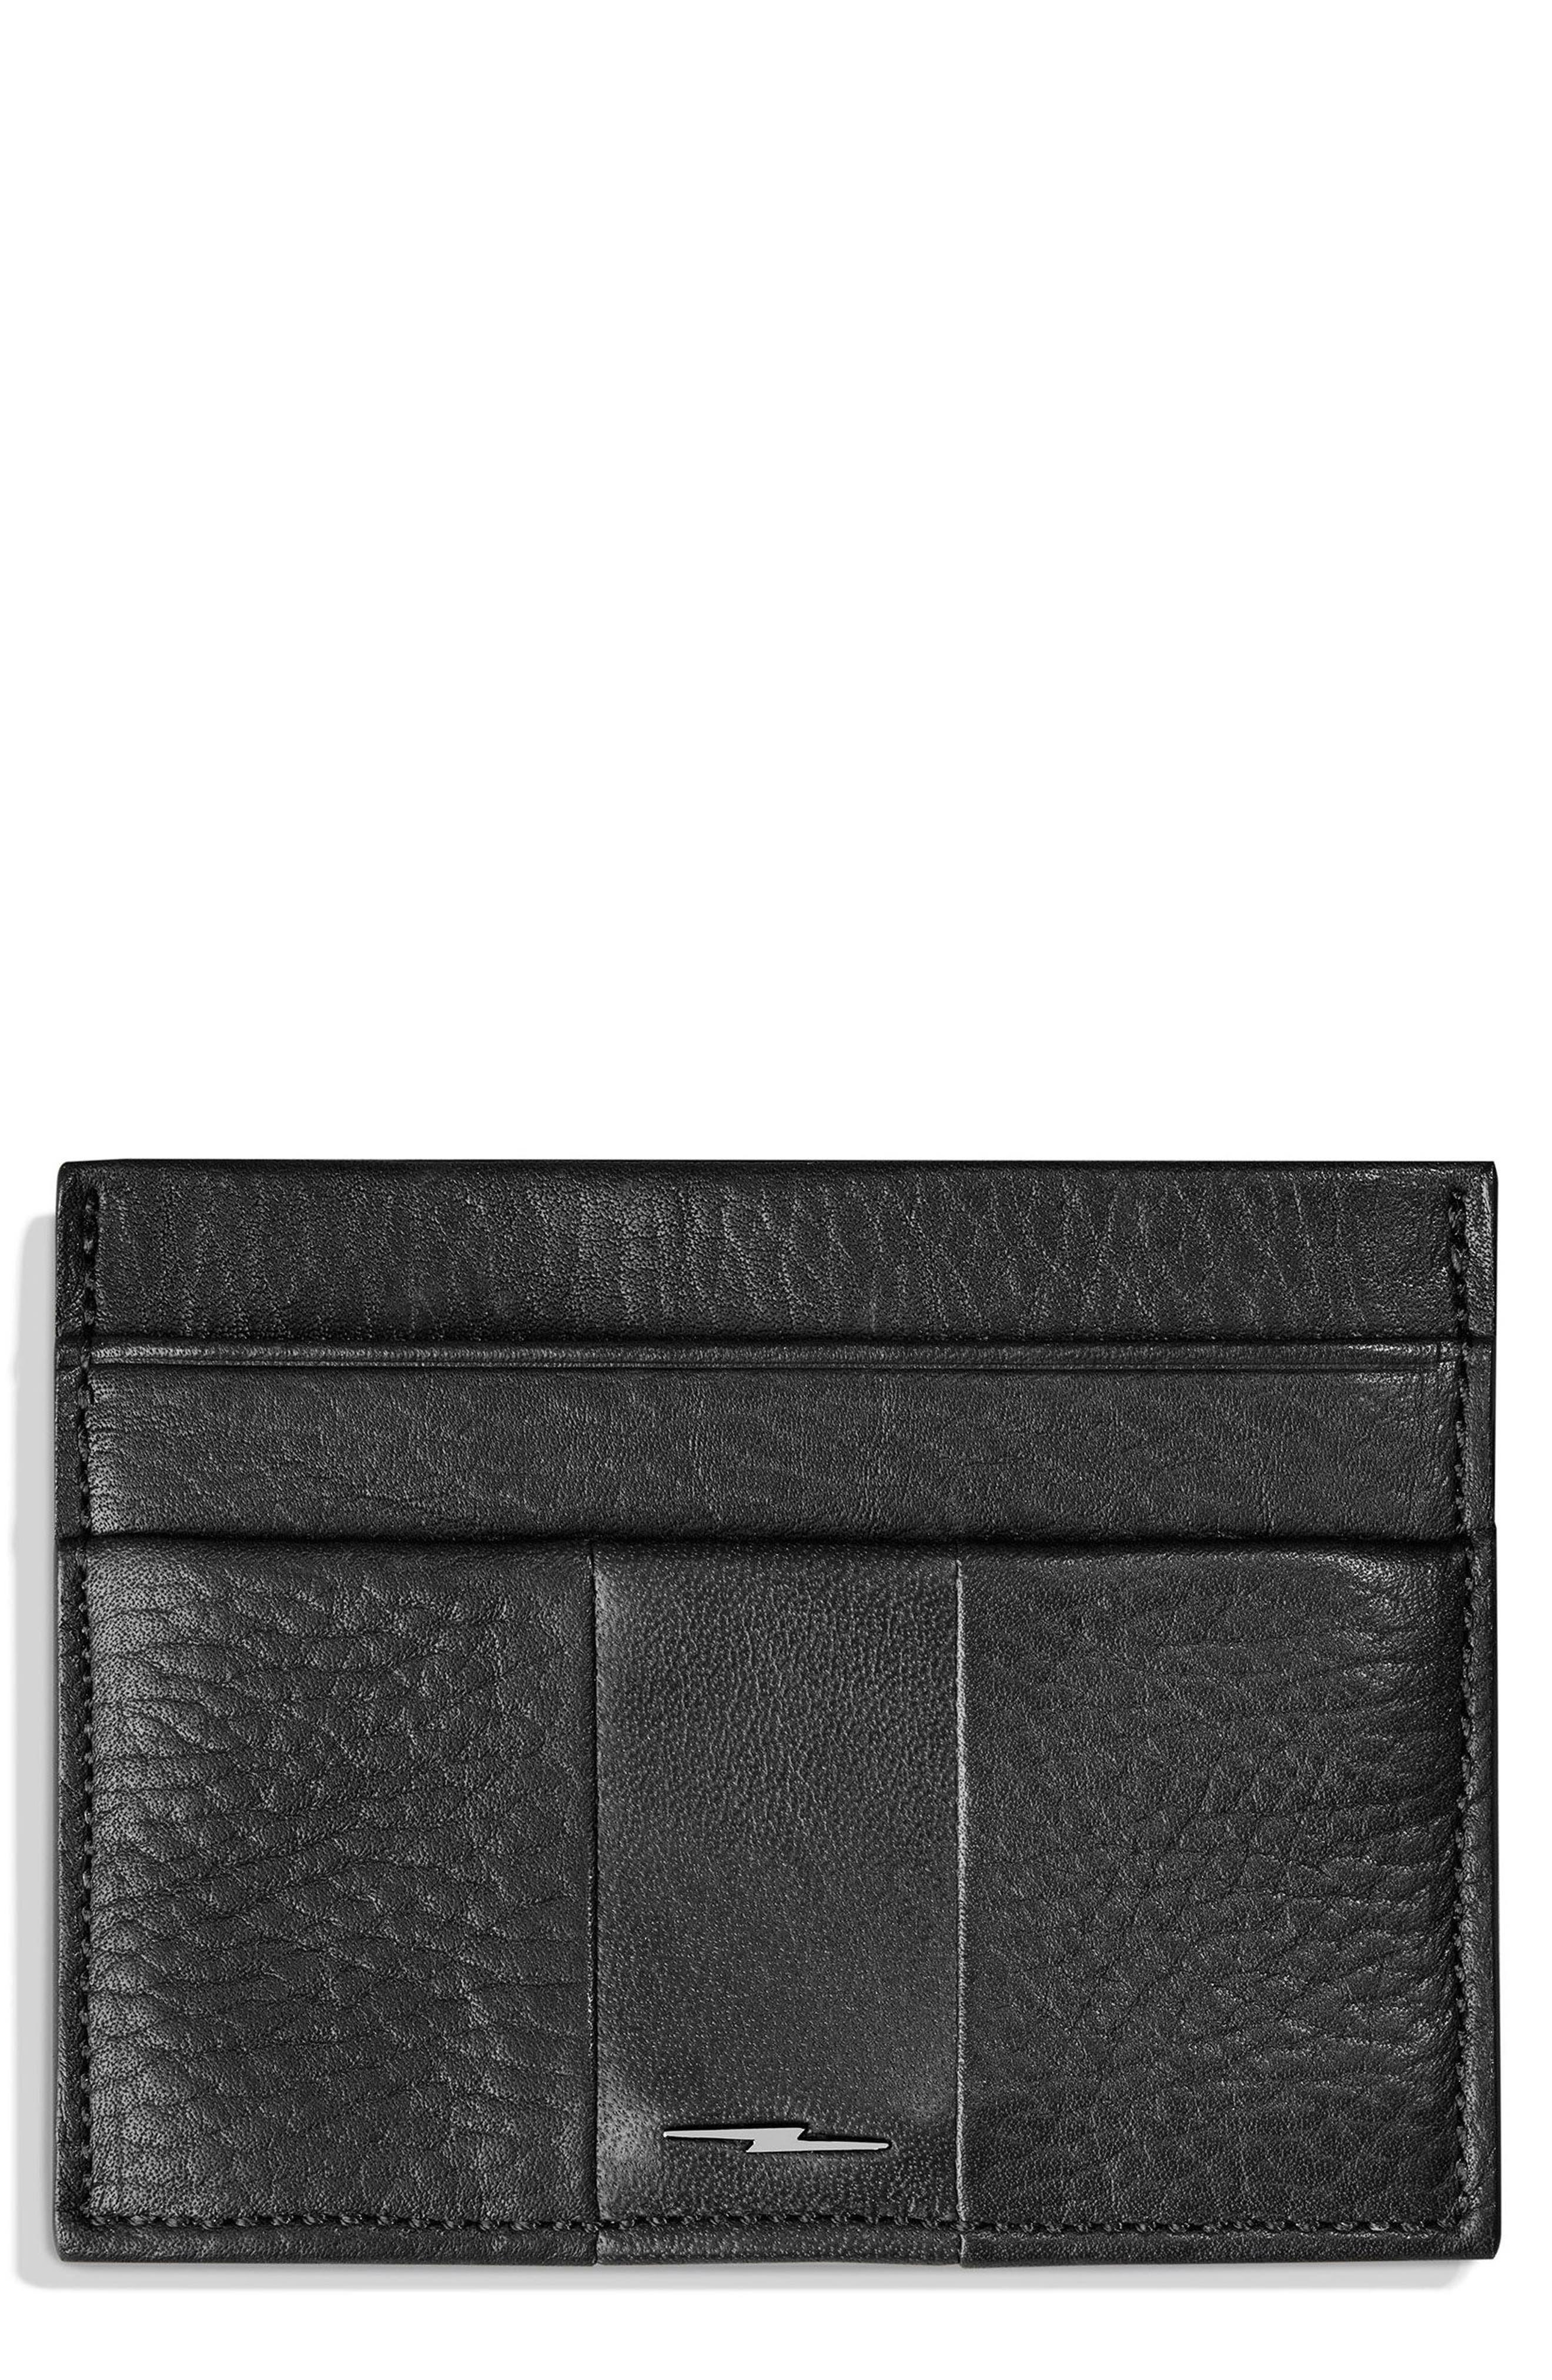 Bolt Leather Card Case,                             Main thumbnail 1, color,                             BLACK